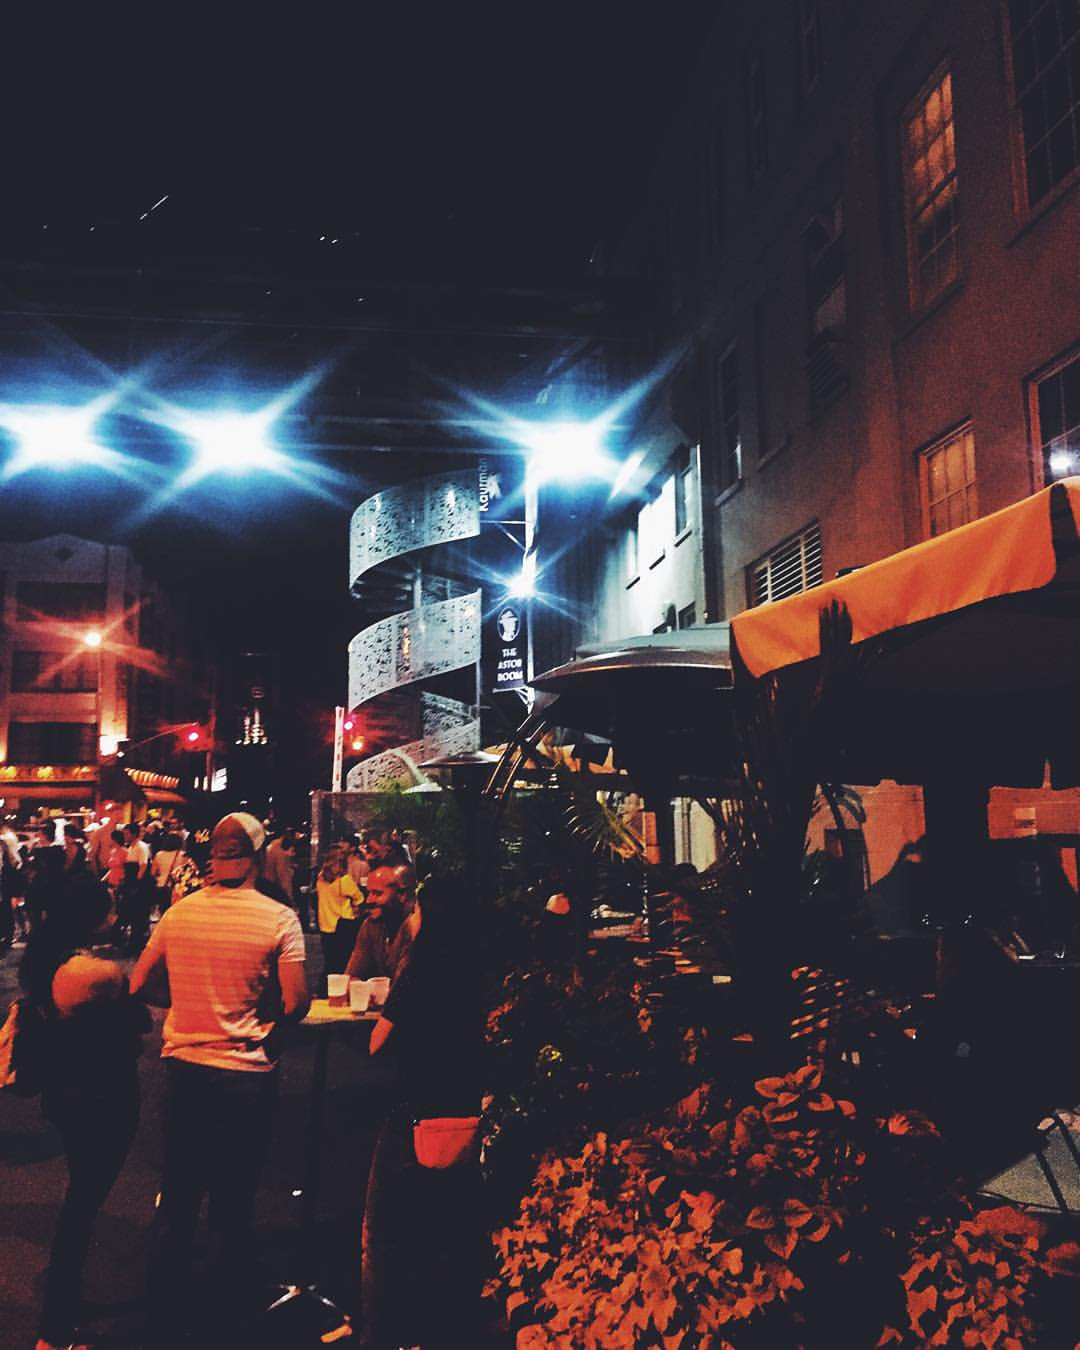 Last weekend at the Astoria Flea Night Market (at Kaufman Astoria Studios)!